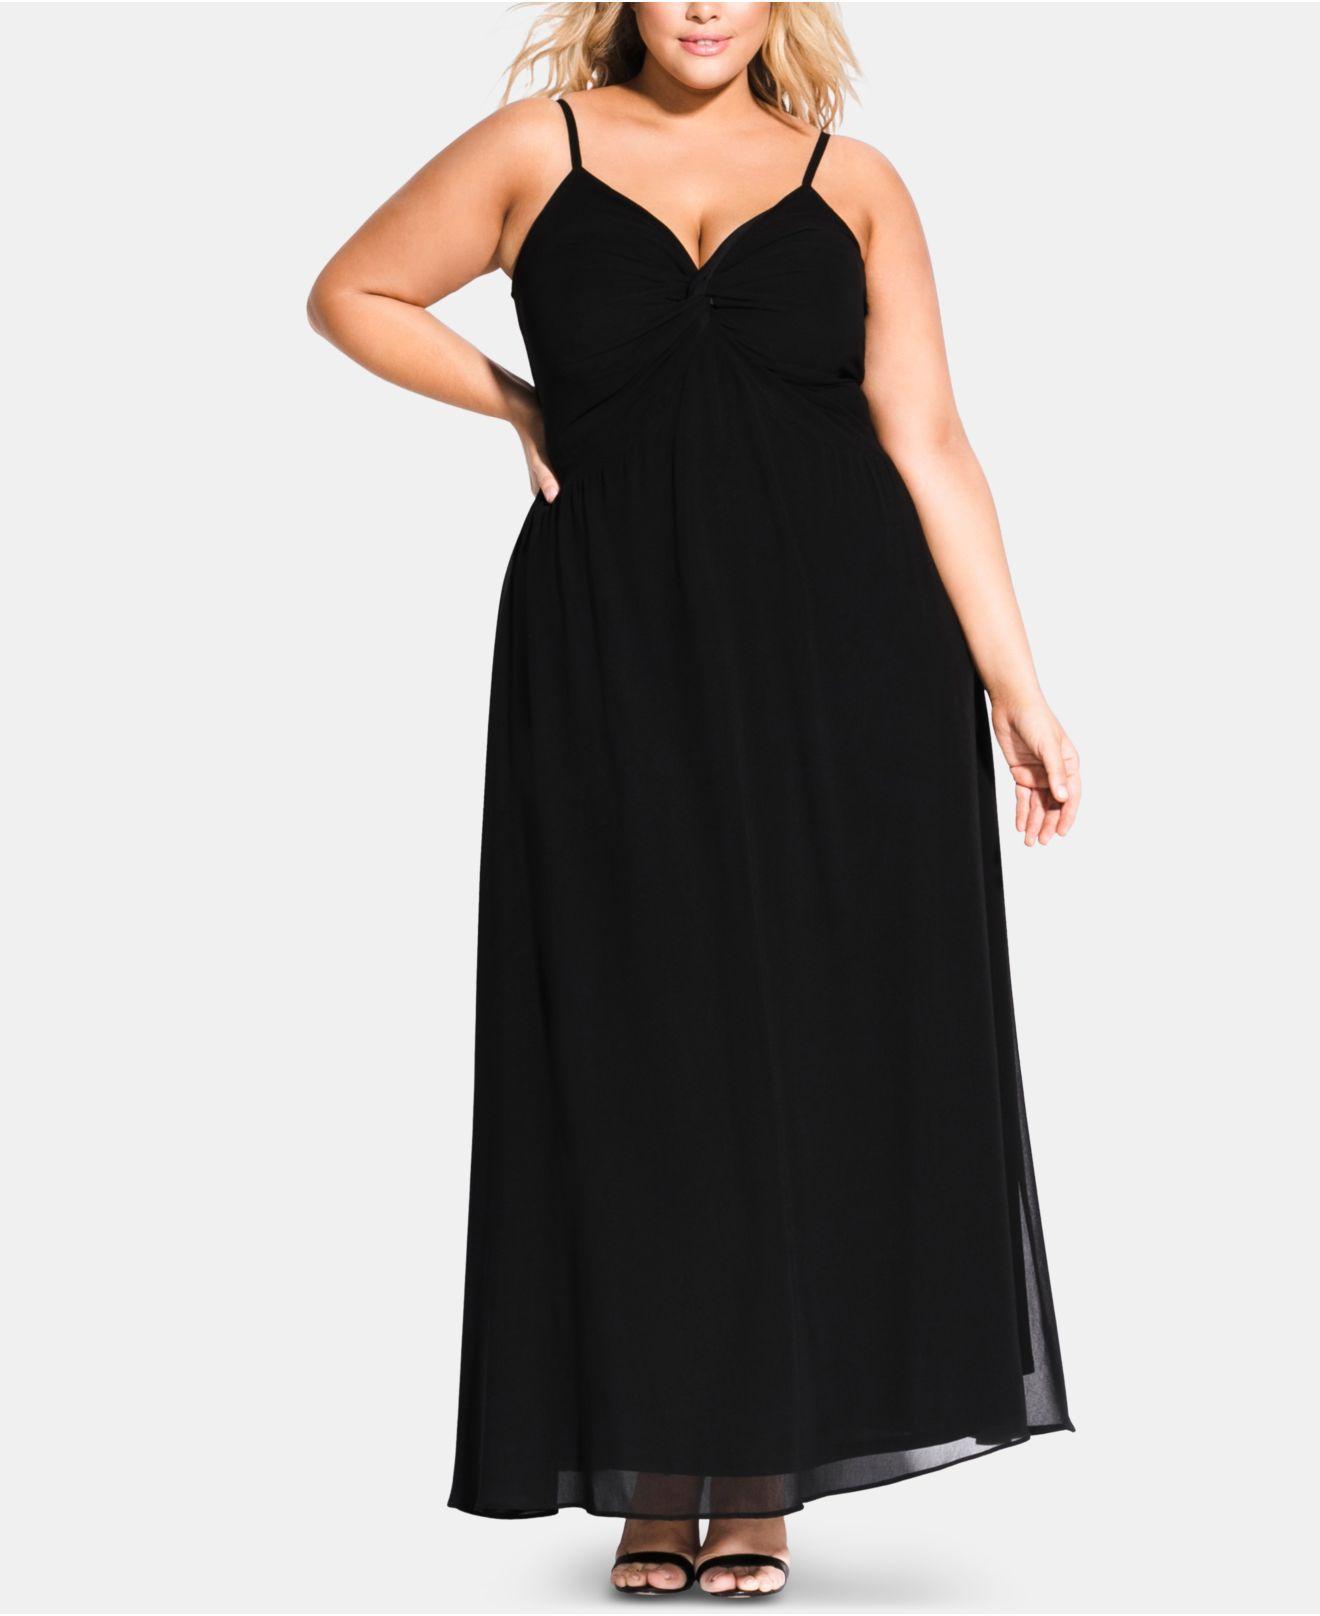 efcfccb6b1 Lyst - City Chic Trendy Plus Size Ambrosia Twist Maxi Dress in Black ...